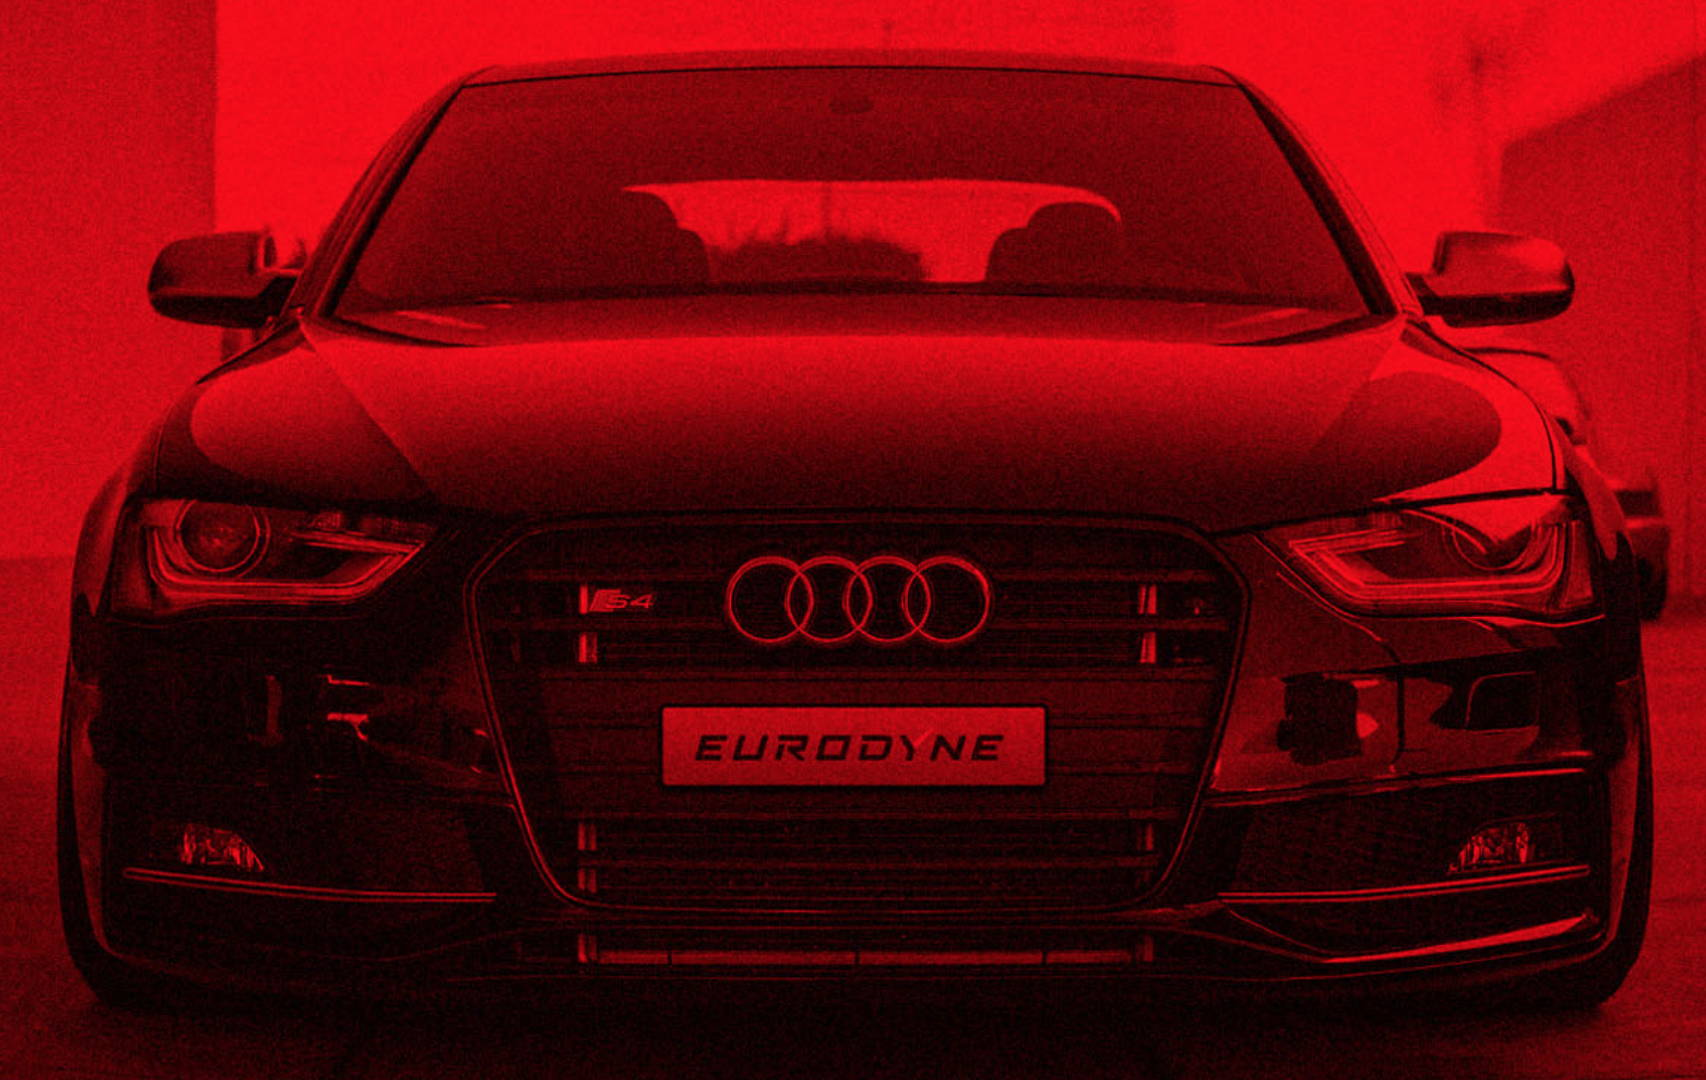 Eurodyne - Performance Software for your VW/Audi/Porsche